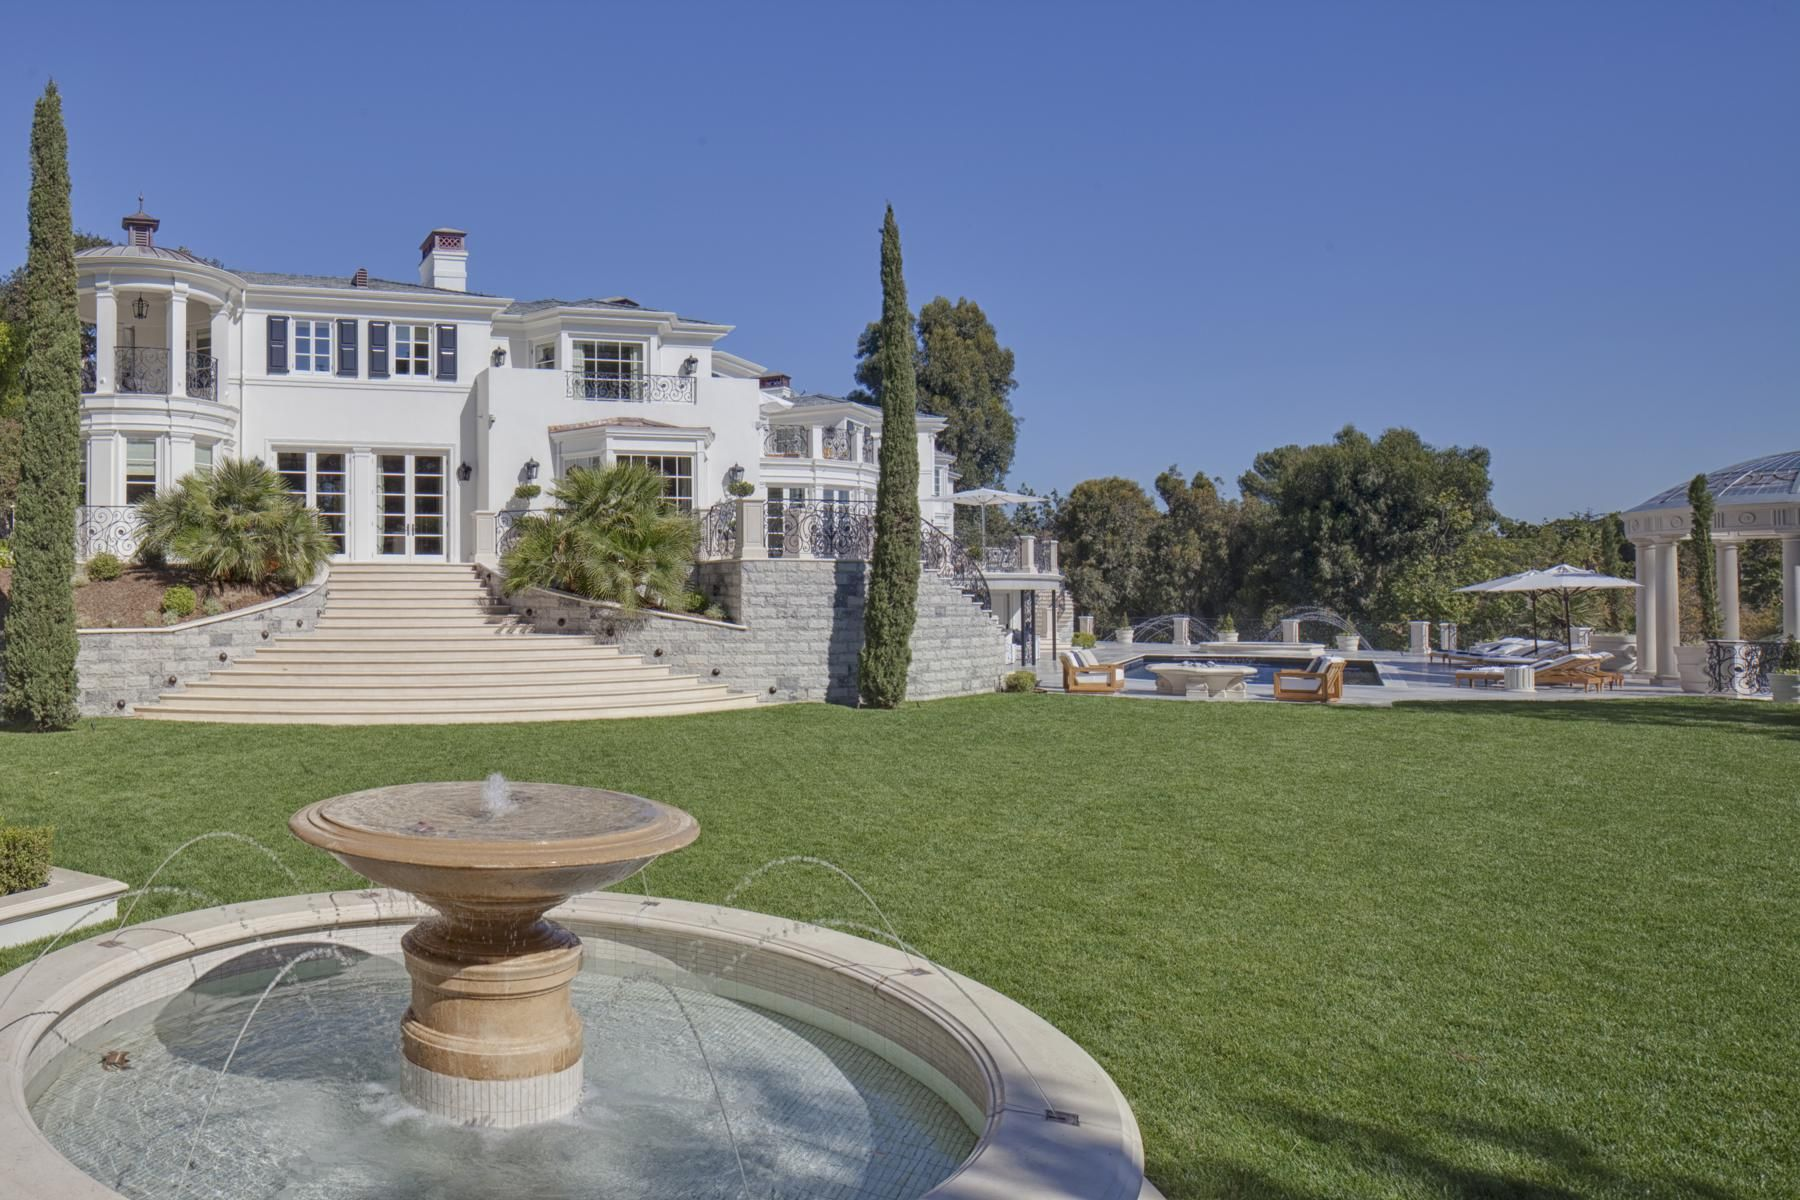 Kenny Rogers Home Sells For 50 To Secret Buyer Celebrity House Pictures Mansão Inspiração Jardim